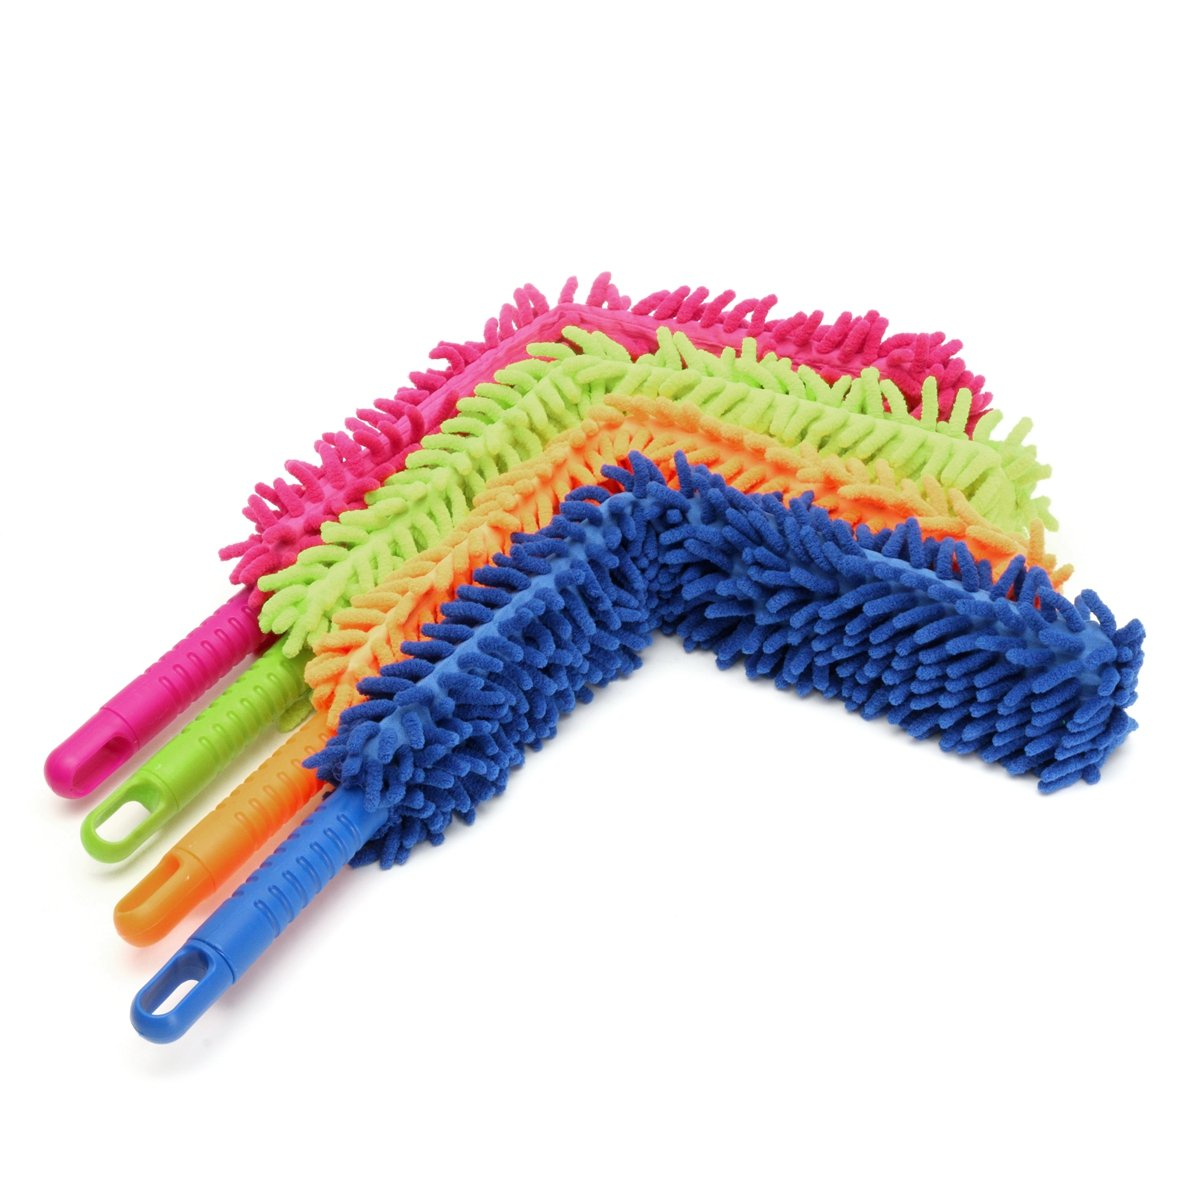 Car Cleaning Equipments - Brush Flexible Microfiber Noodle Chenille Alloy Wheel Cleaner Car Wash - Gondola Launder Skirmish Auto Moisten Sweep Cable Lave Encounter - 1PCs